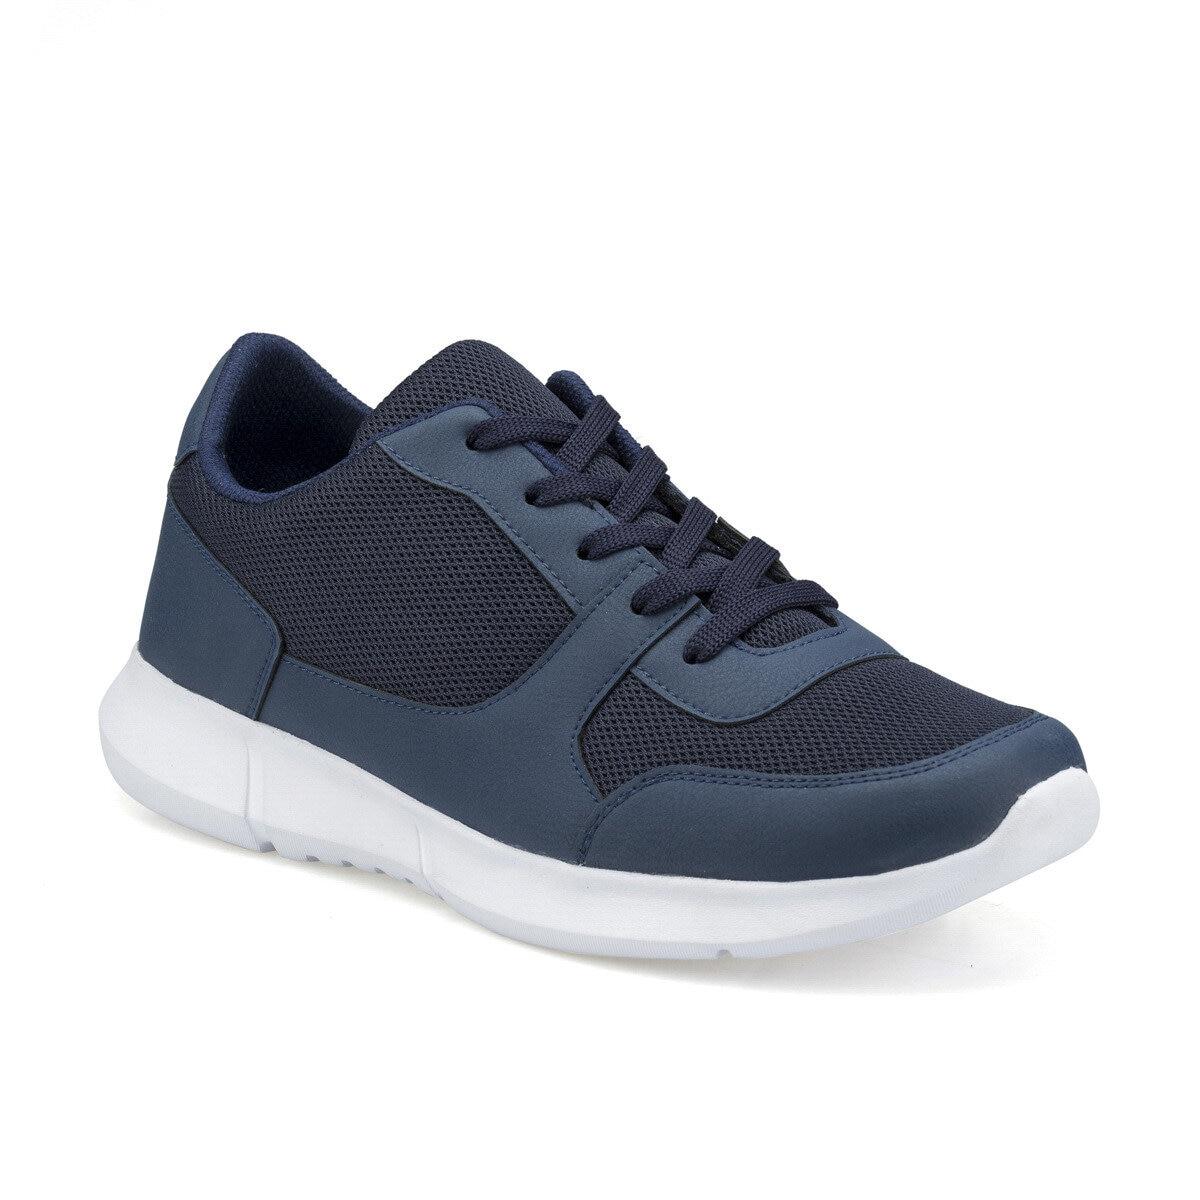 FLO 356512.M Black Men 'S Sneaker Shoes Polaris